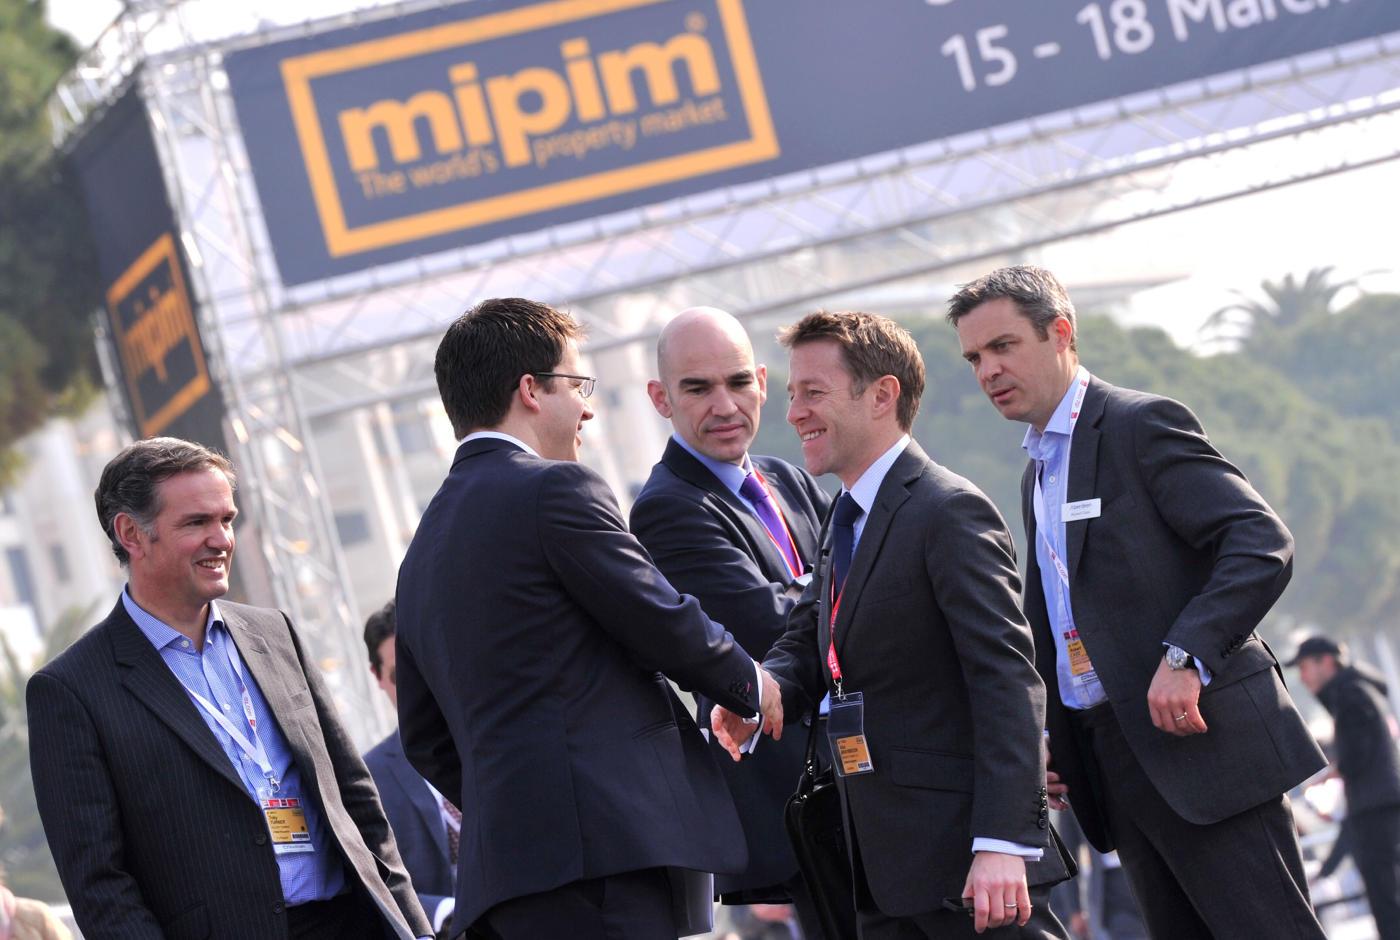 MIPIM-Trends 2015